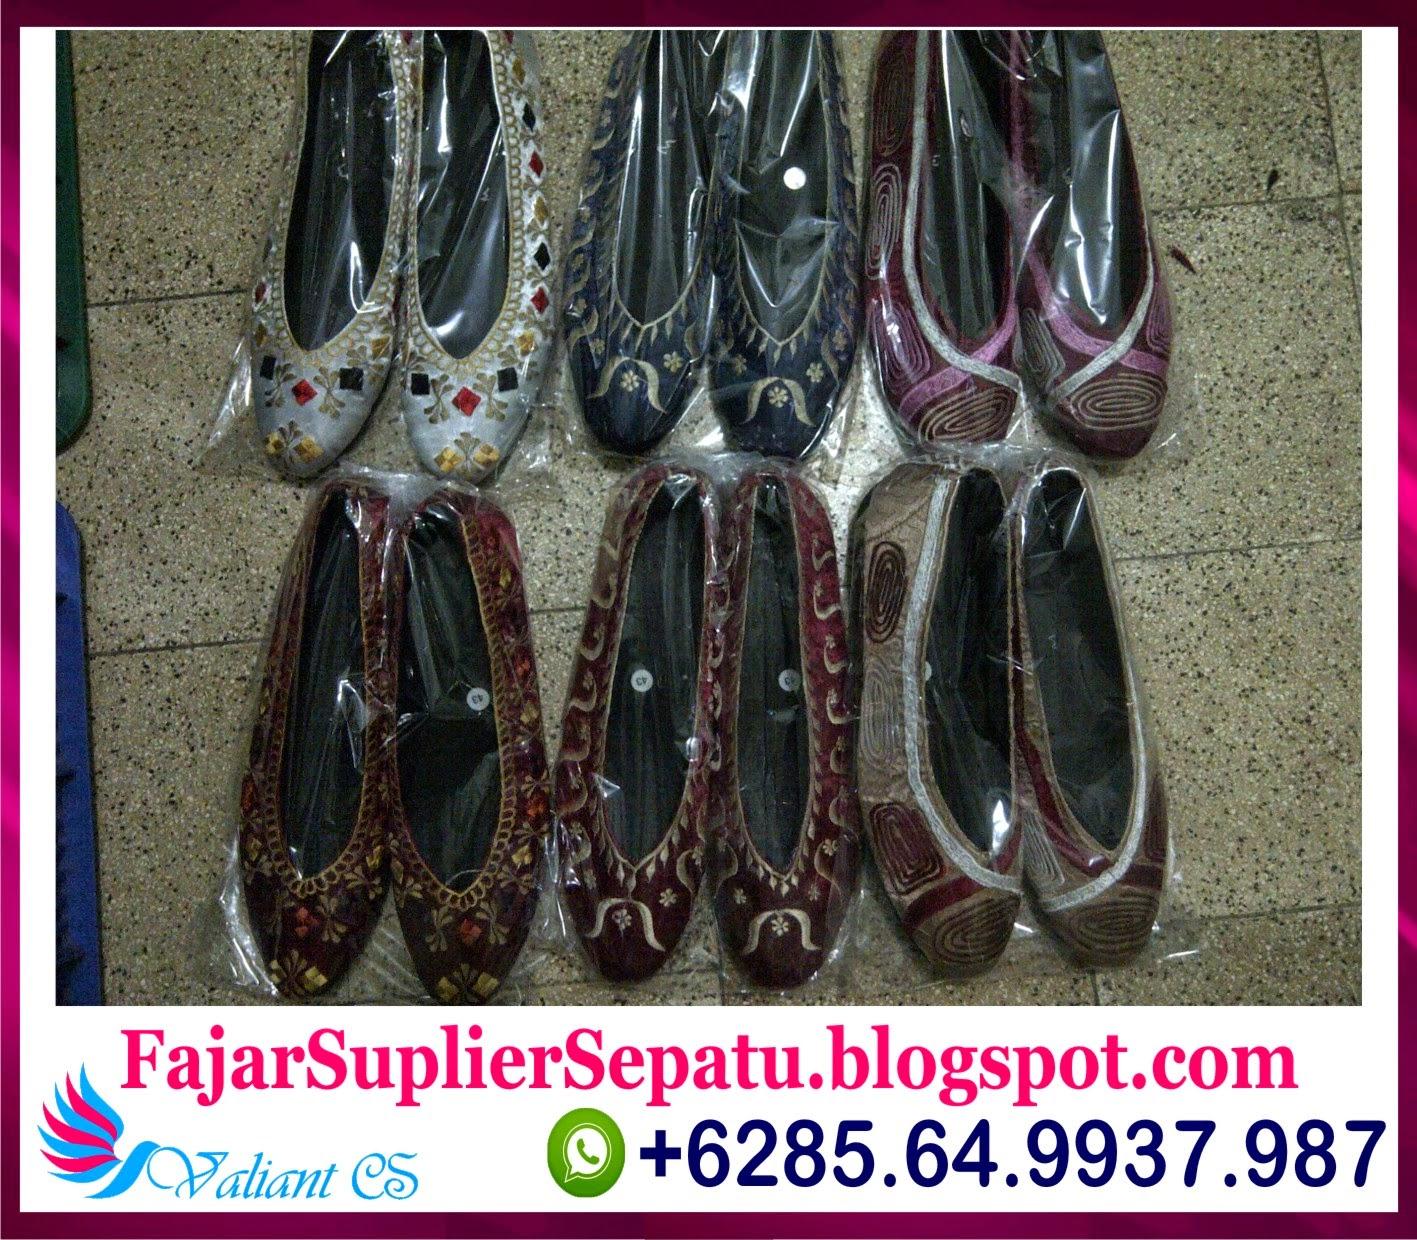 Sepatu Bordir Murah, Grosir Sepatu Bordir Murah, Produsen Sepatu Bordir Murah, +62.8564.993.7987